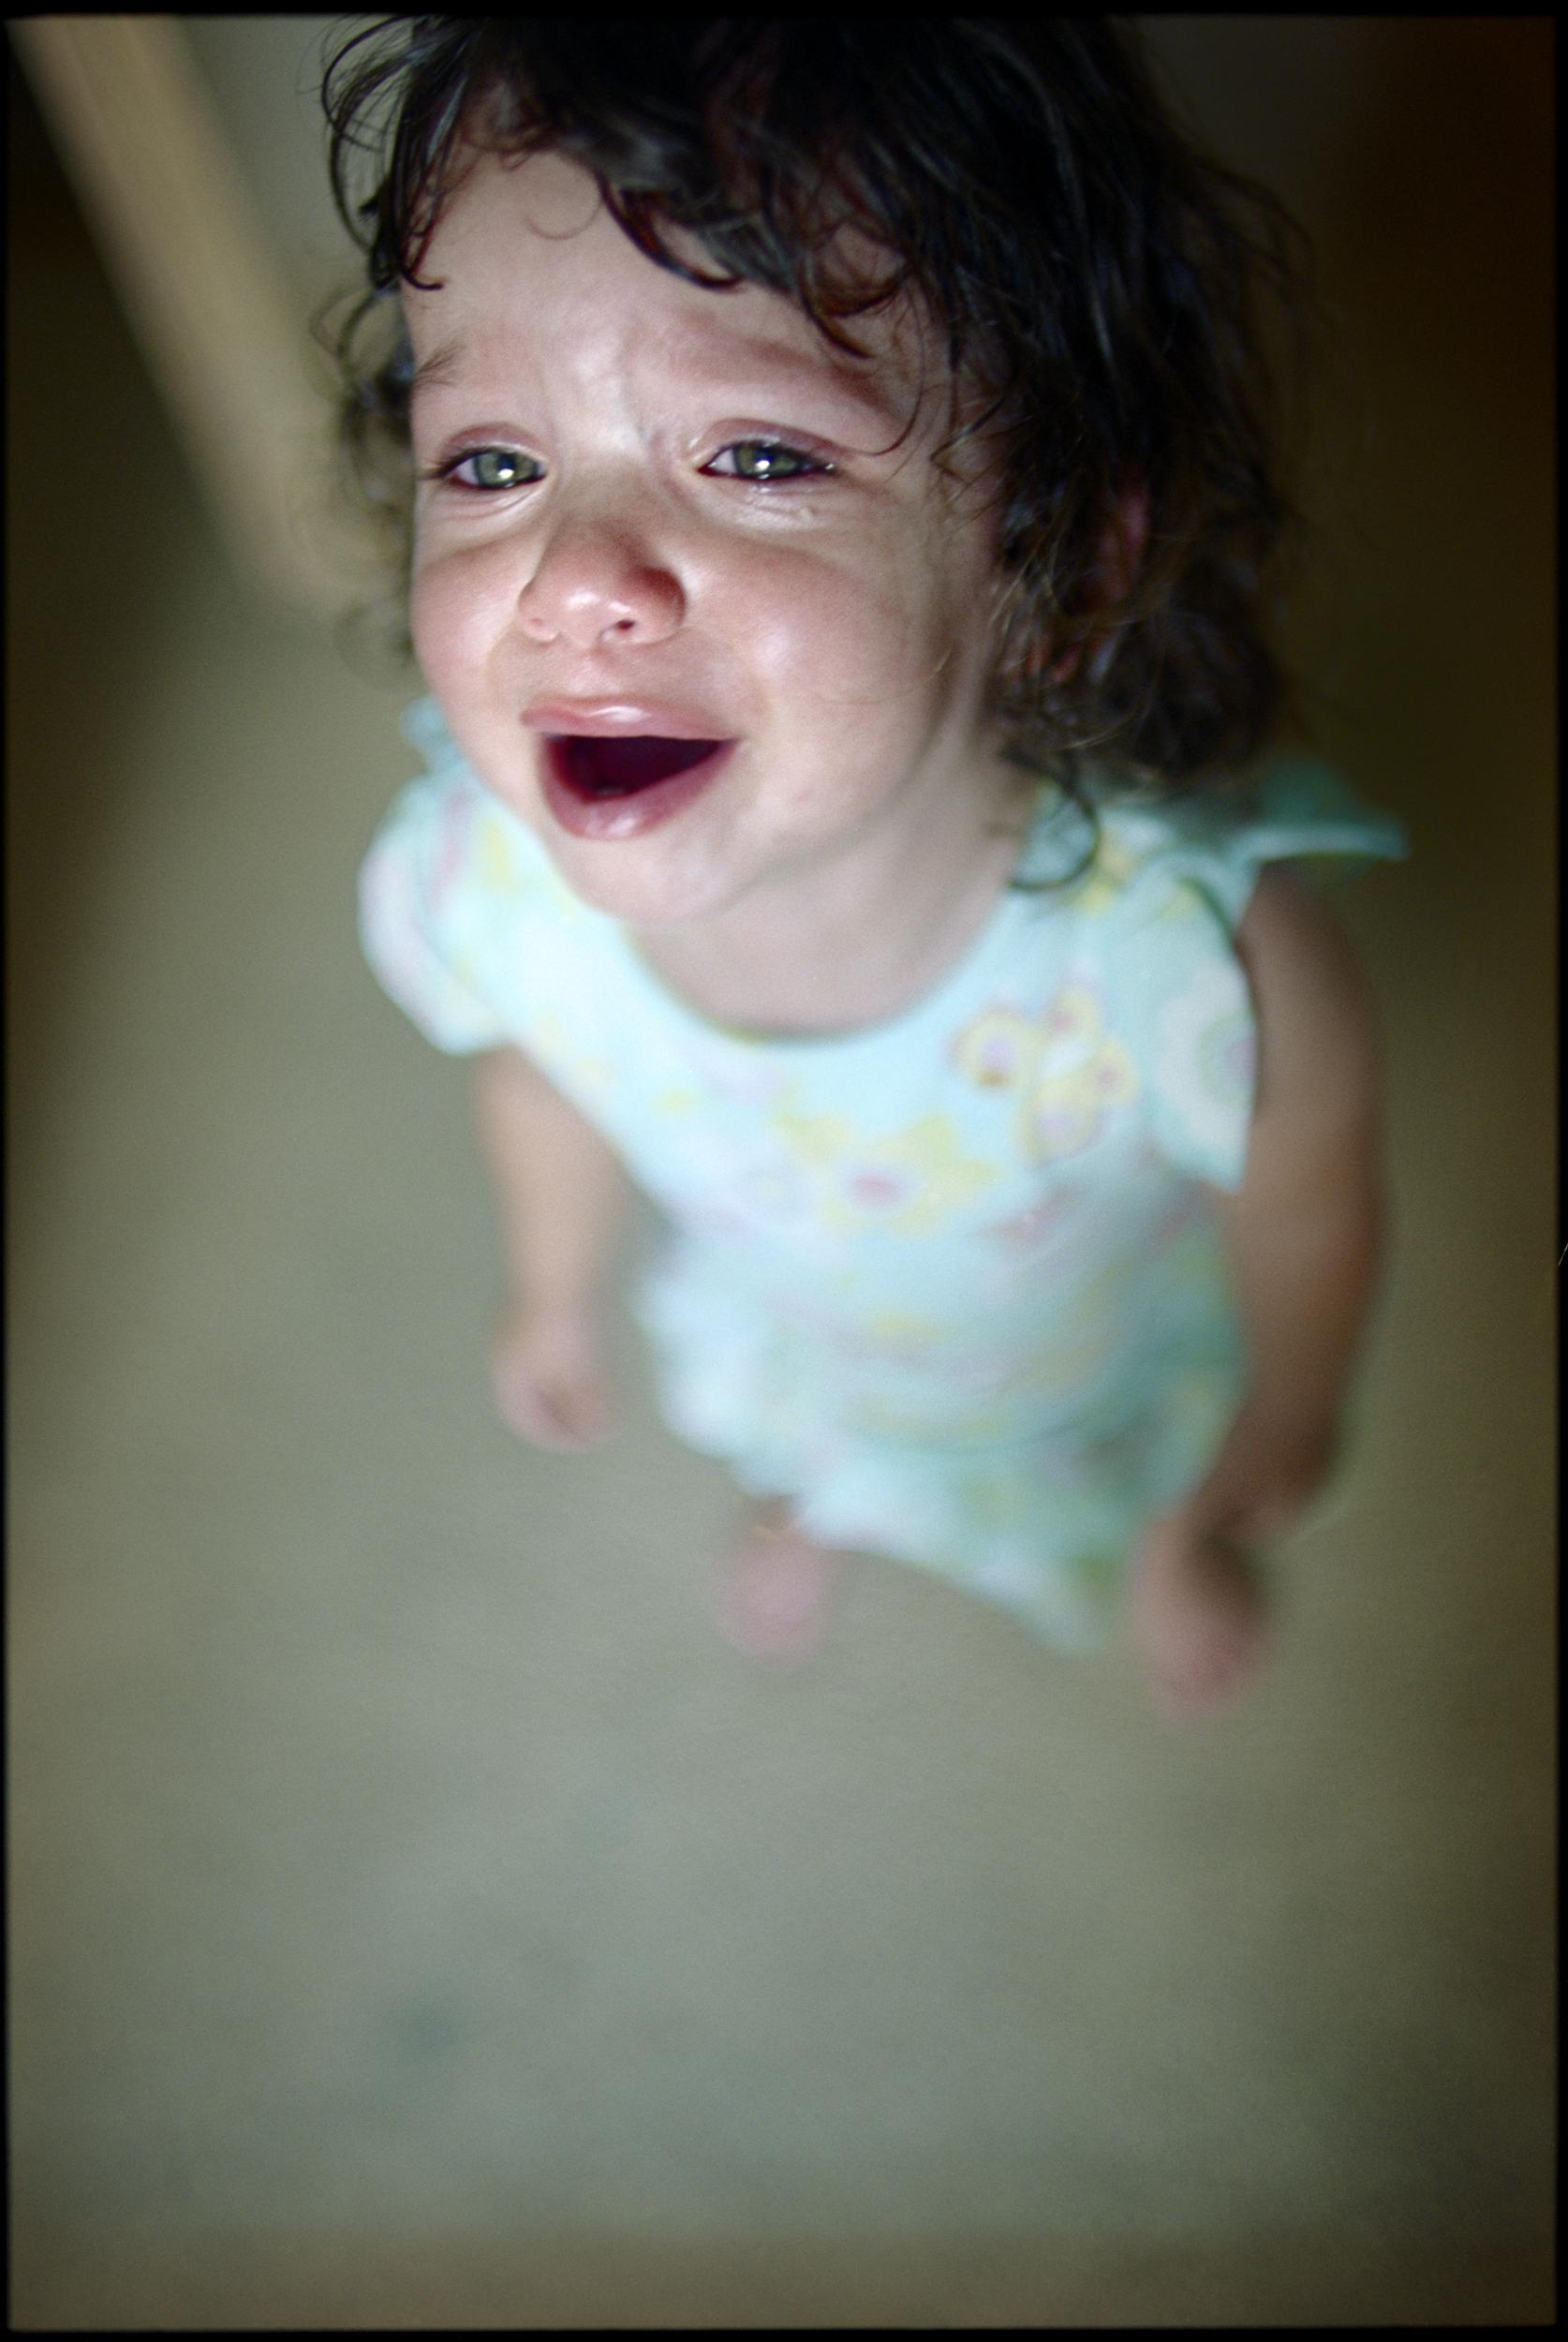 Emmanuelle crying 2006.jpg